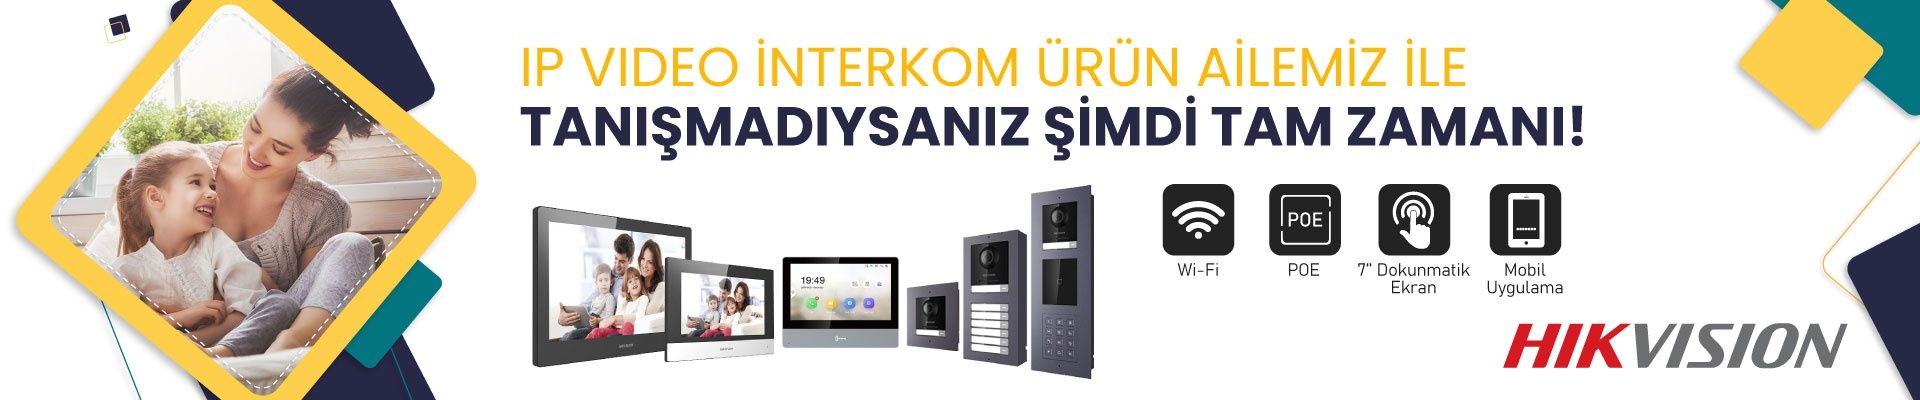 Hikvision Yeni Nesil Modüler Ip Video İnterkom Sistemi